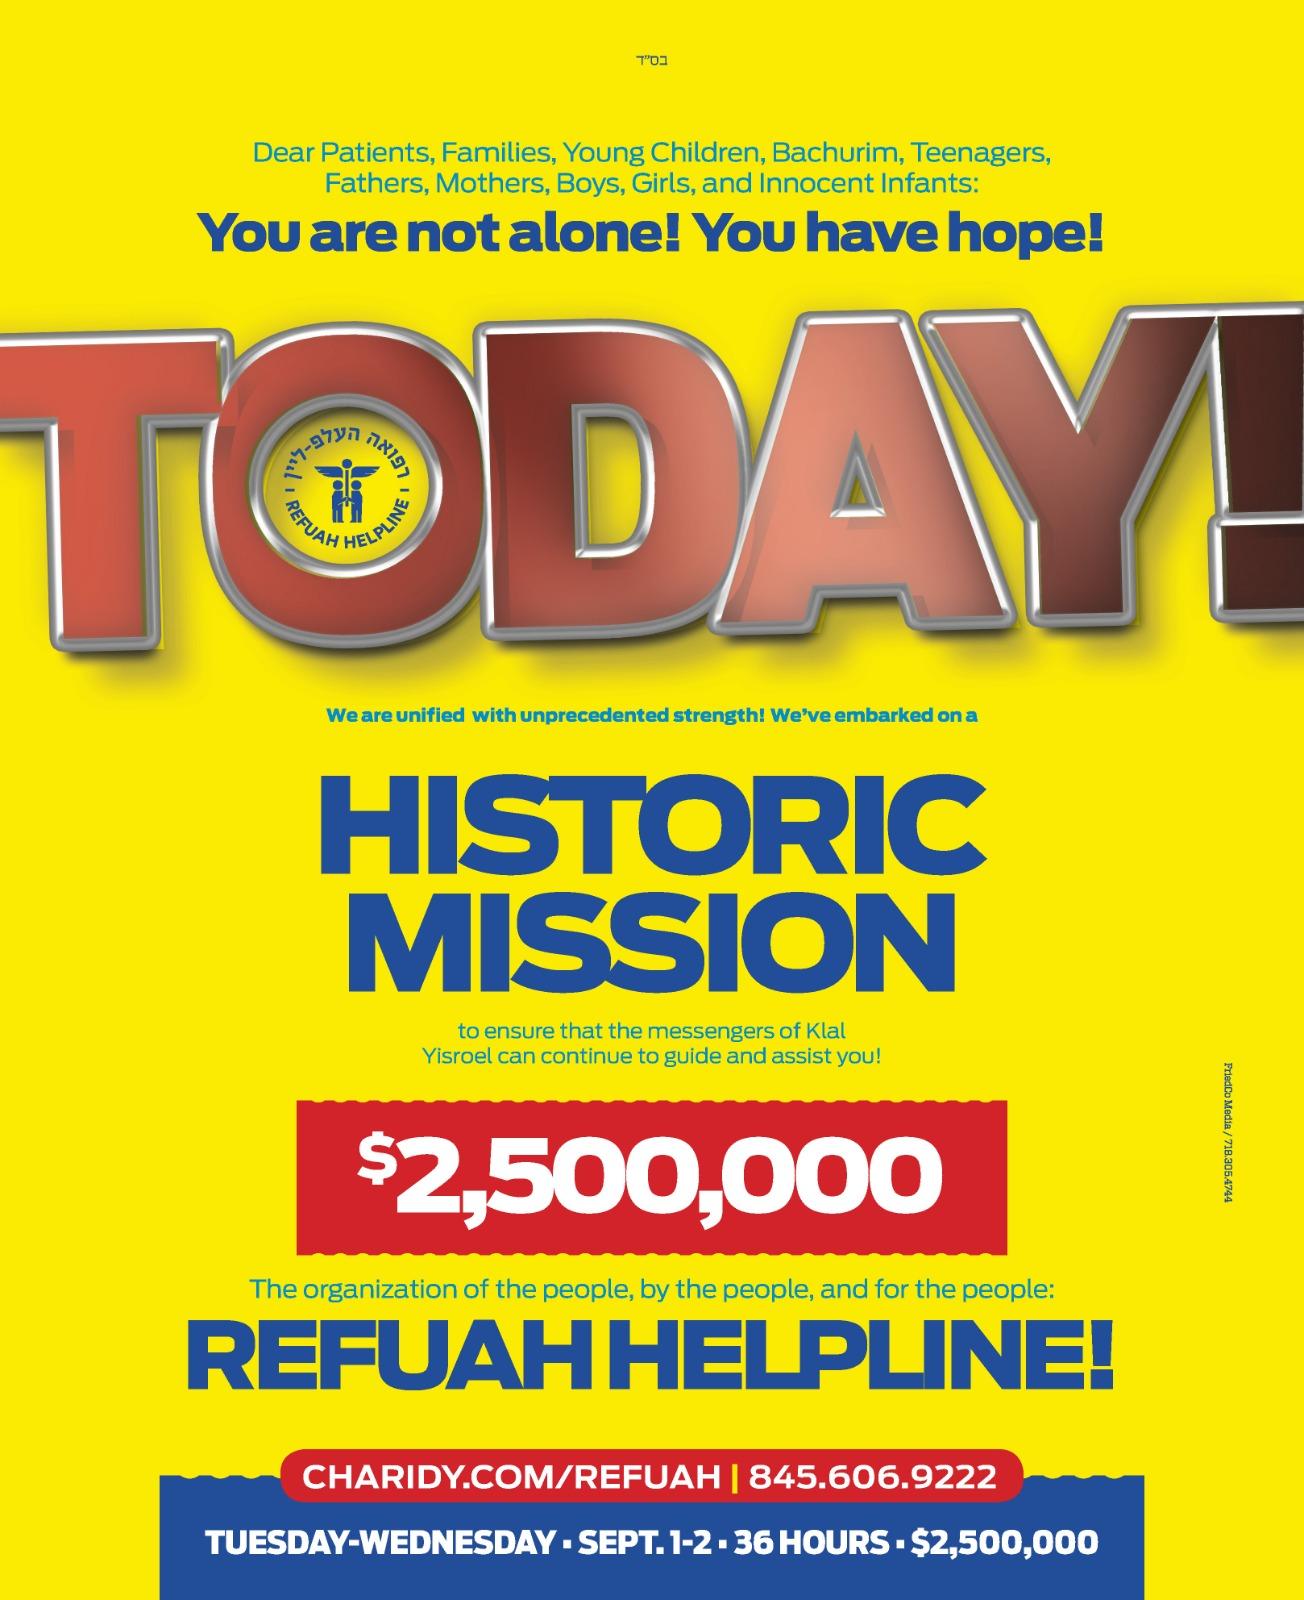 Massive grassroots effort to raise $2.5 million on behalf of Refuah Helpline culminates tonight